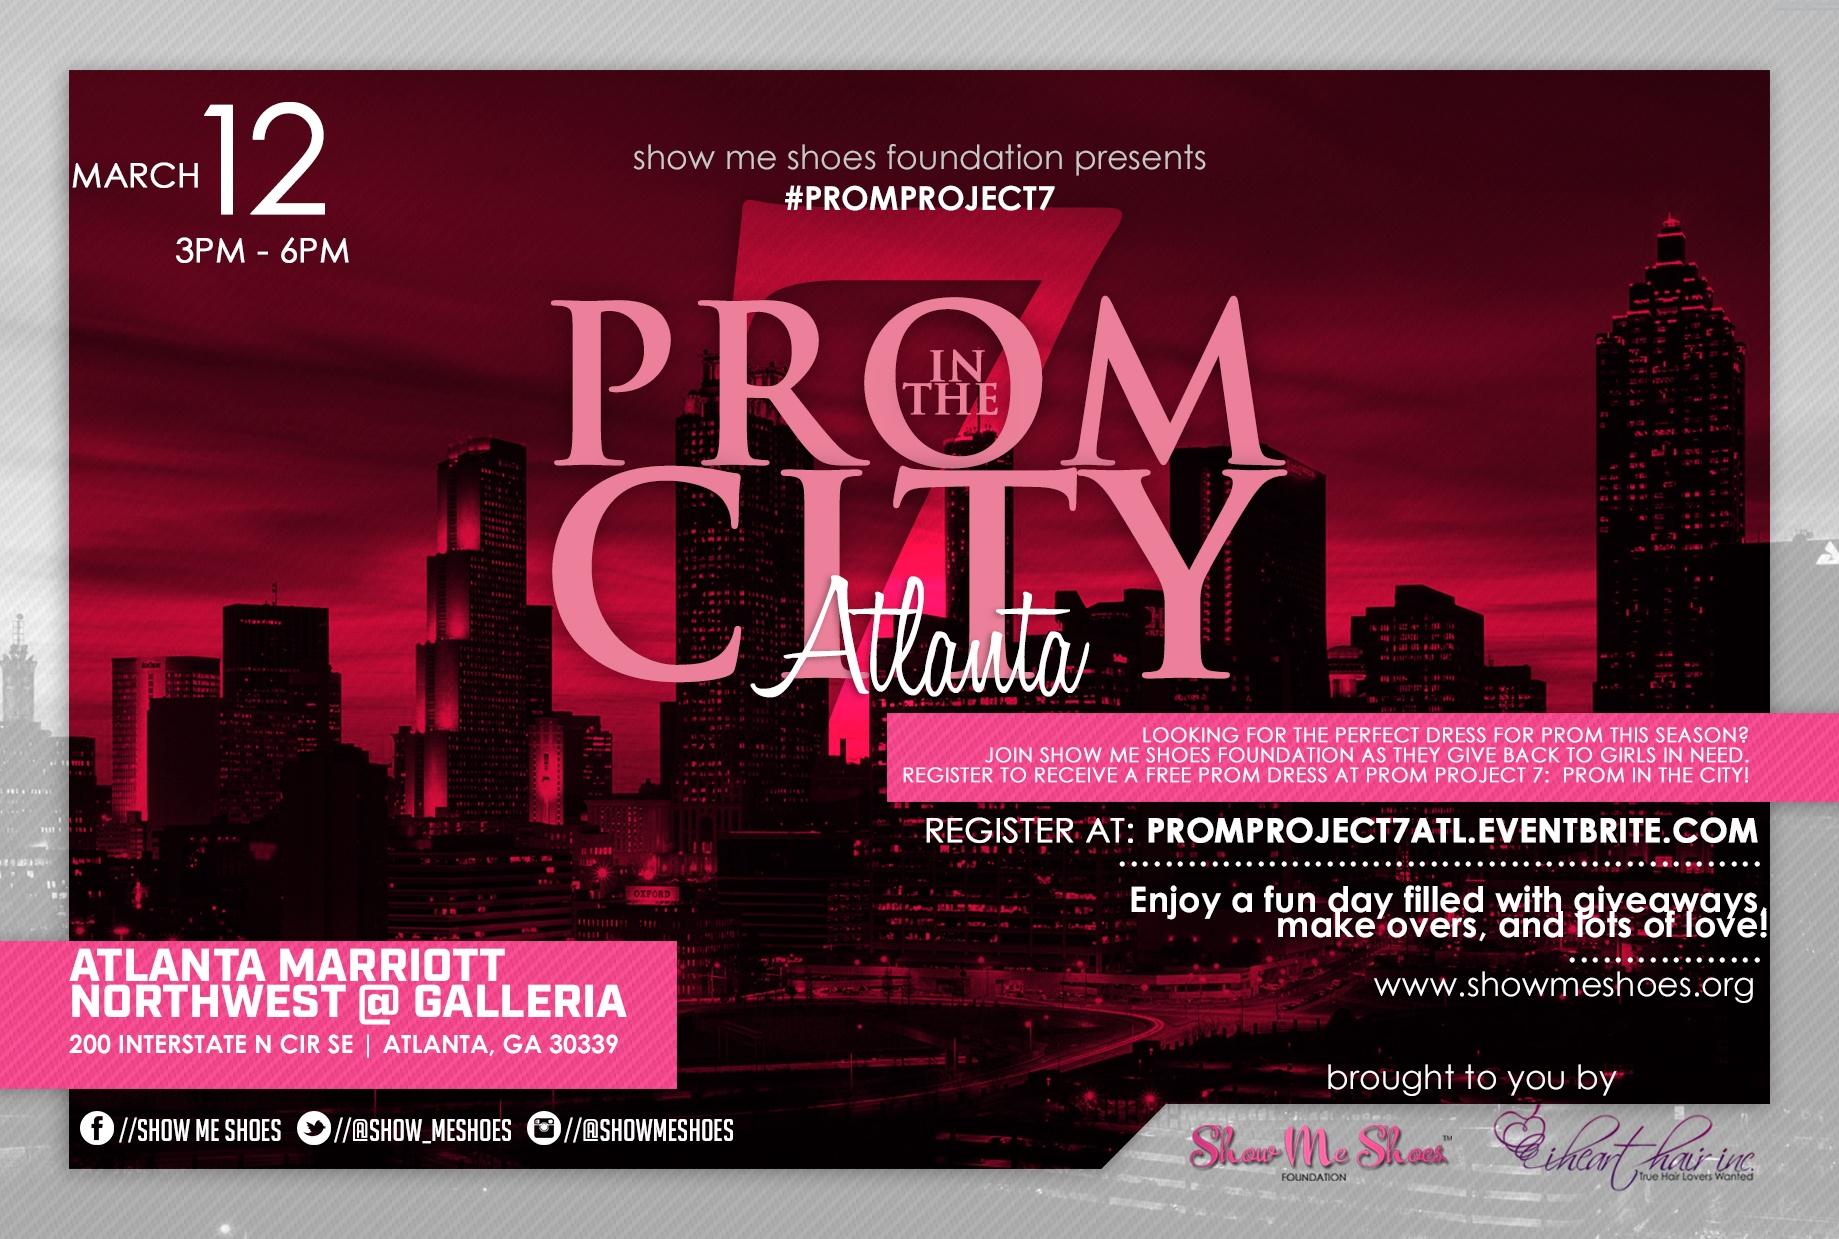 #PromProject7ATL